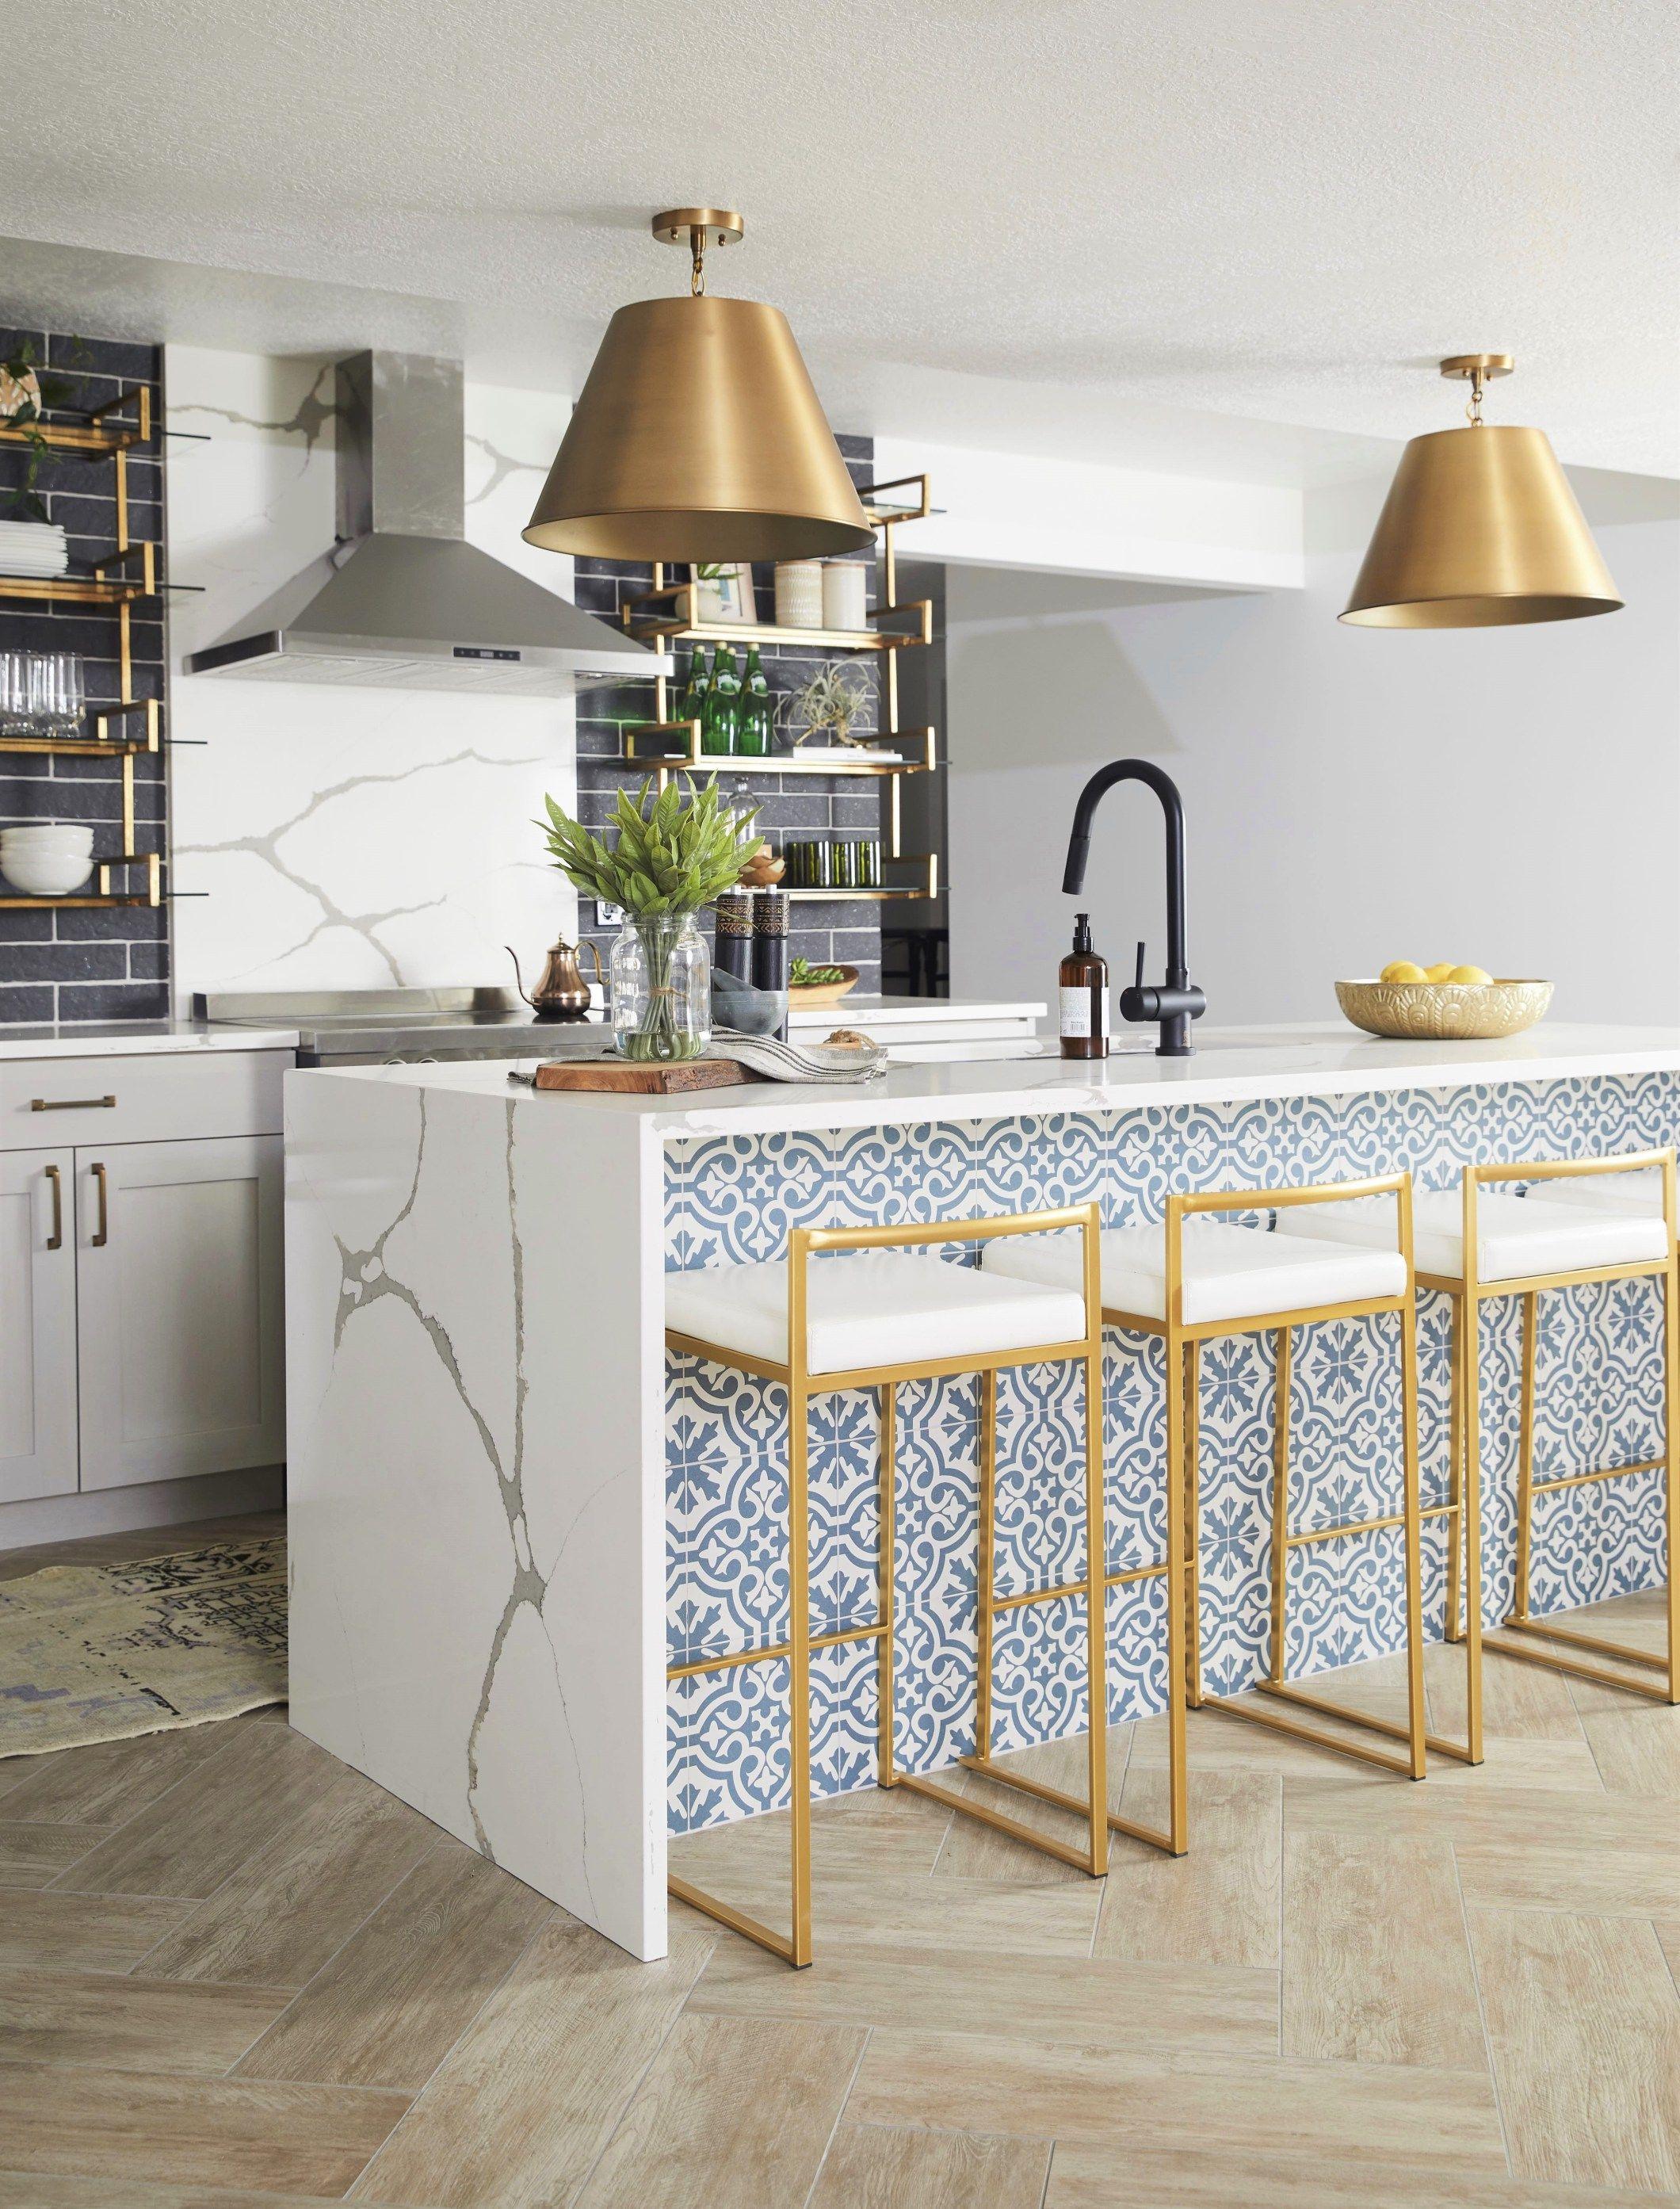 Photo of Cara Loren's Modern Mediterranean | Kitchen Reveal – Andrea West Design